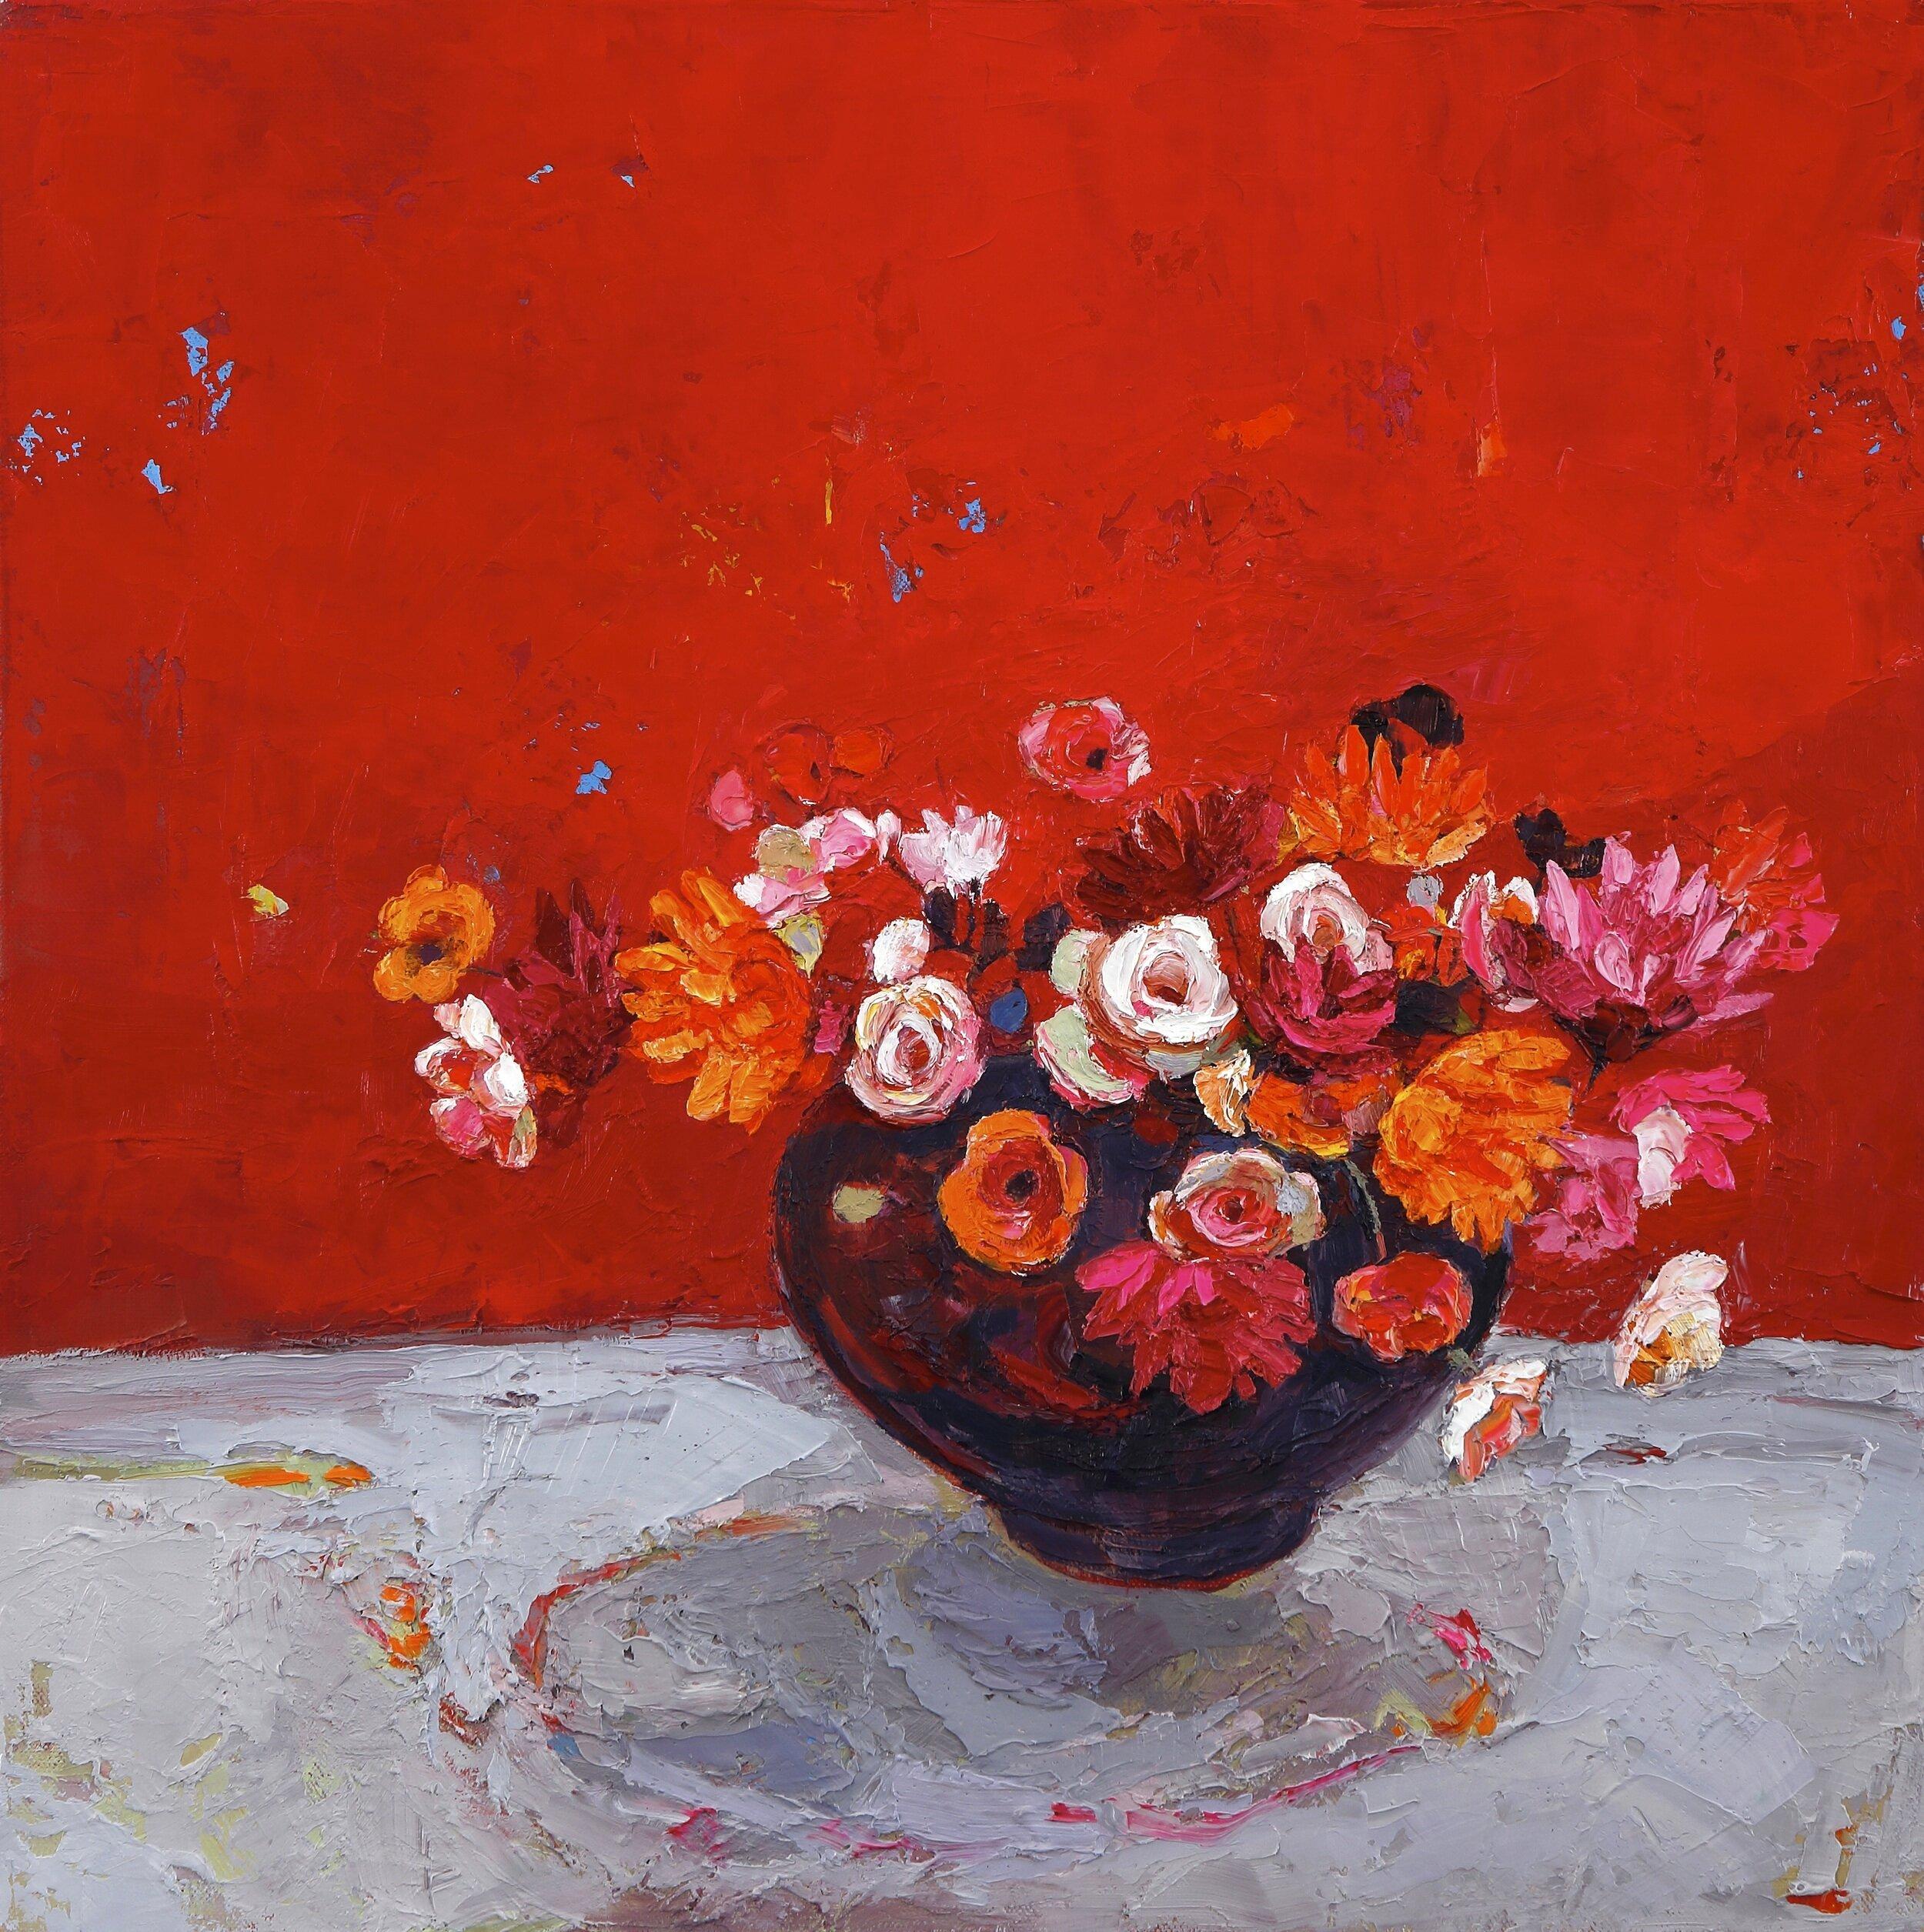 Title: Scarlet Ladies  Size: 20x20in  Medium: Oil on Canvas  Price: £3250